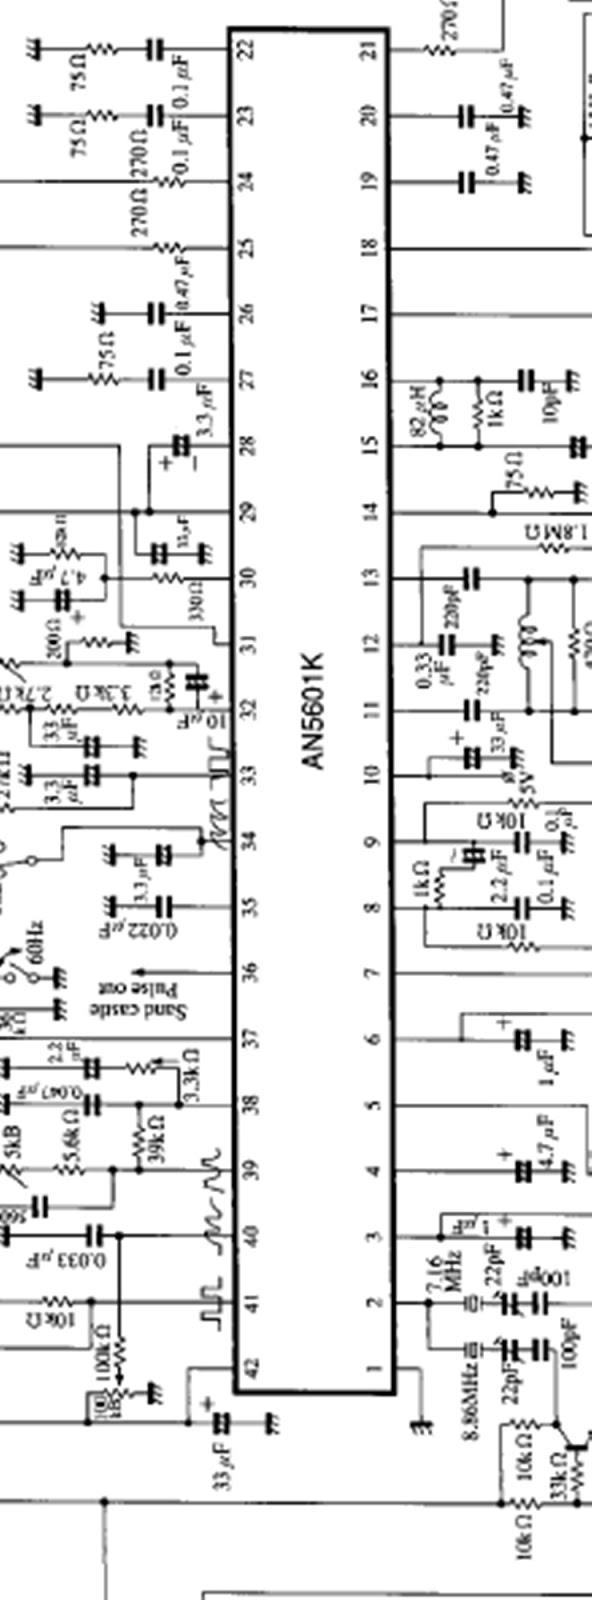 SERVIS TV SALATIGA (lcd/led/tabung): AN 5601K SCEMATIC